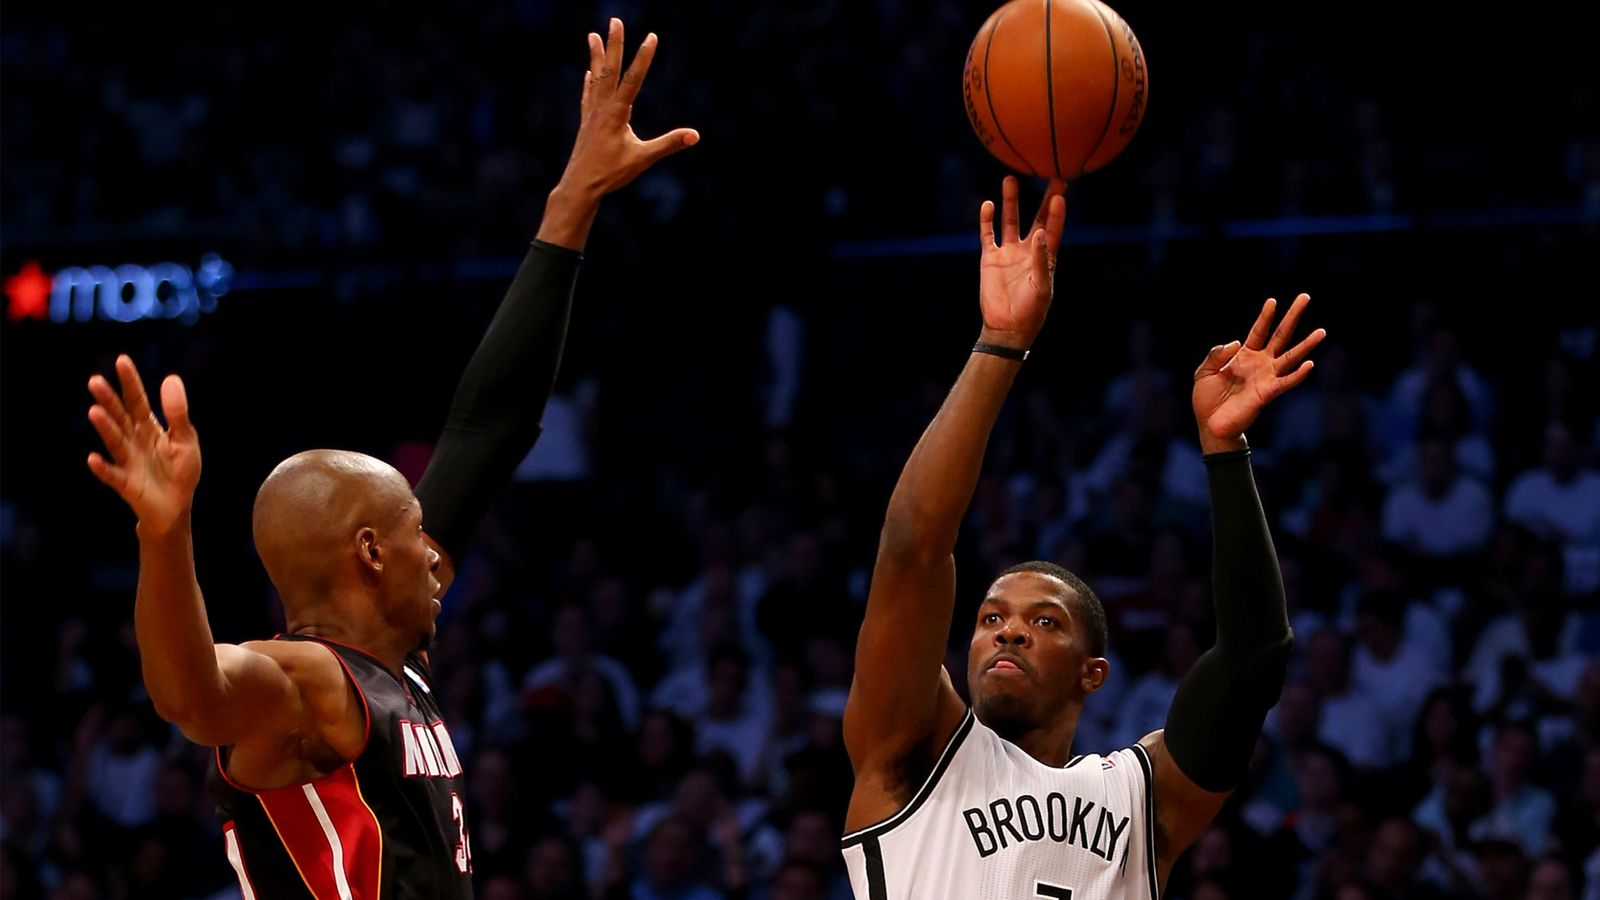 Nba Playoffs Rockets Vs Blazers | Basketball Scores